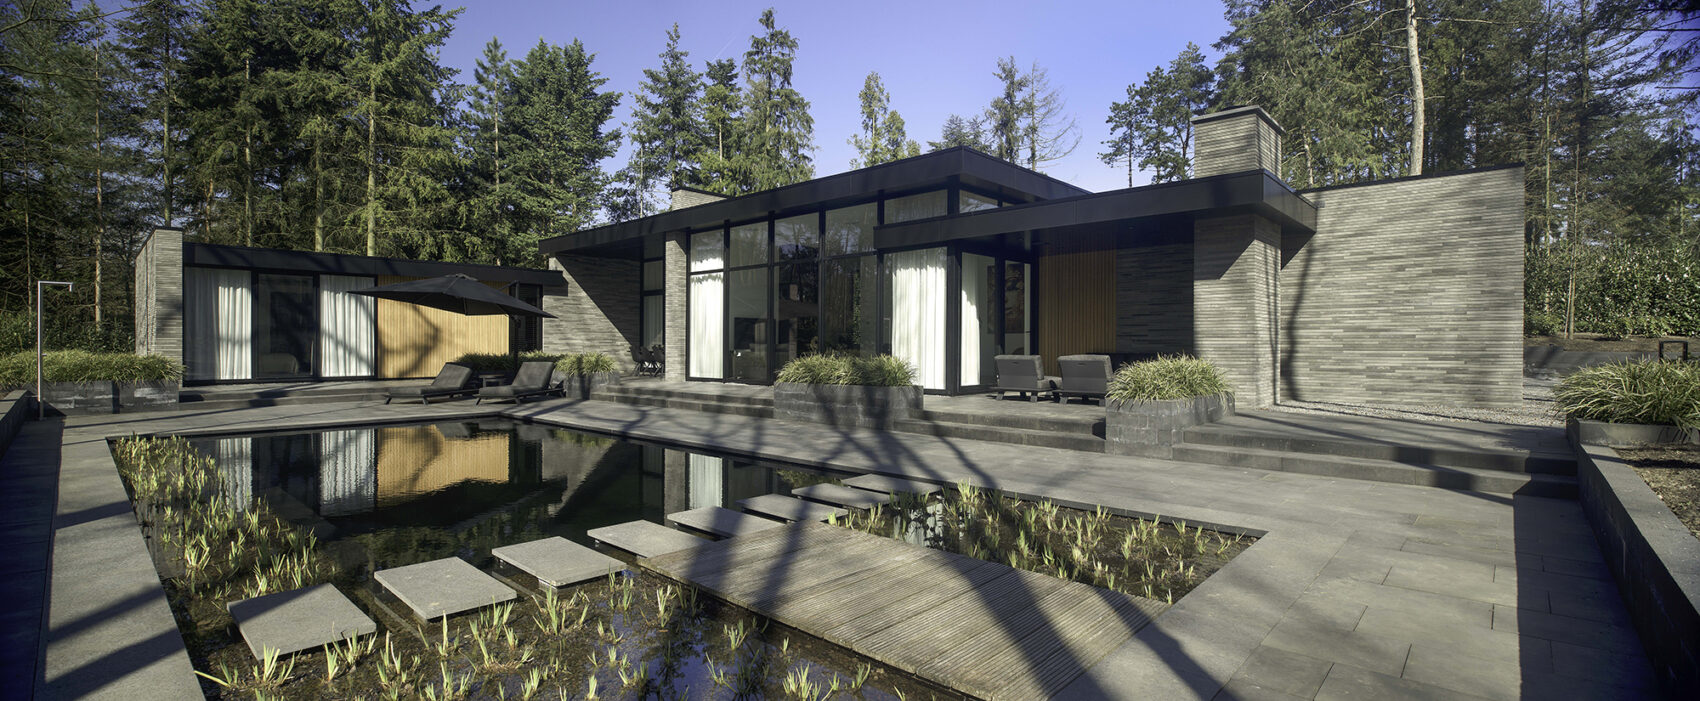 Moderne bosvilla